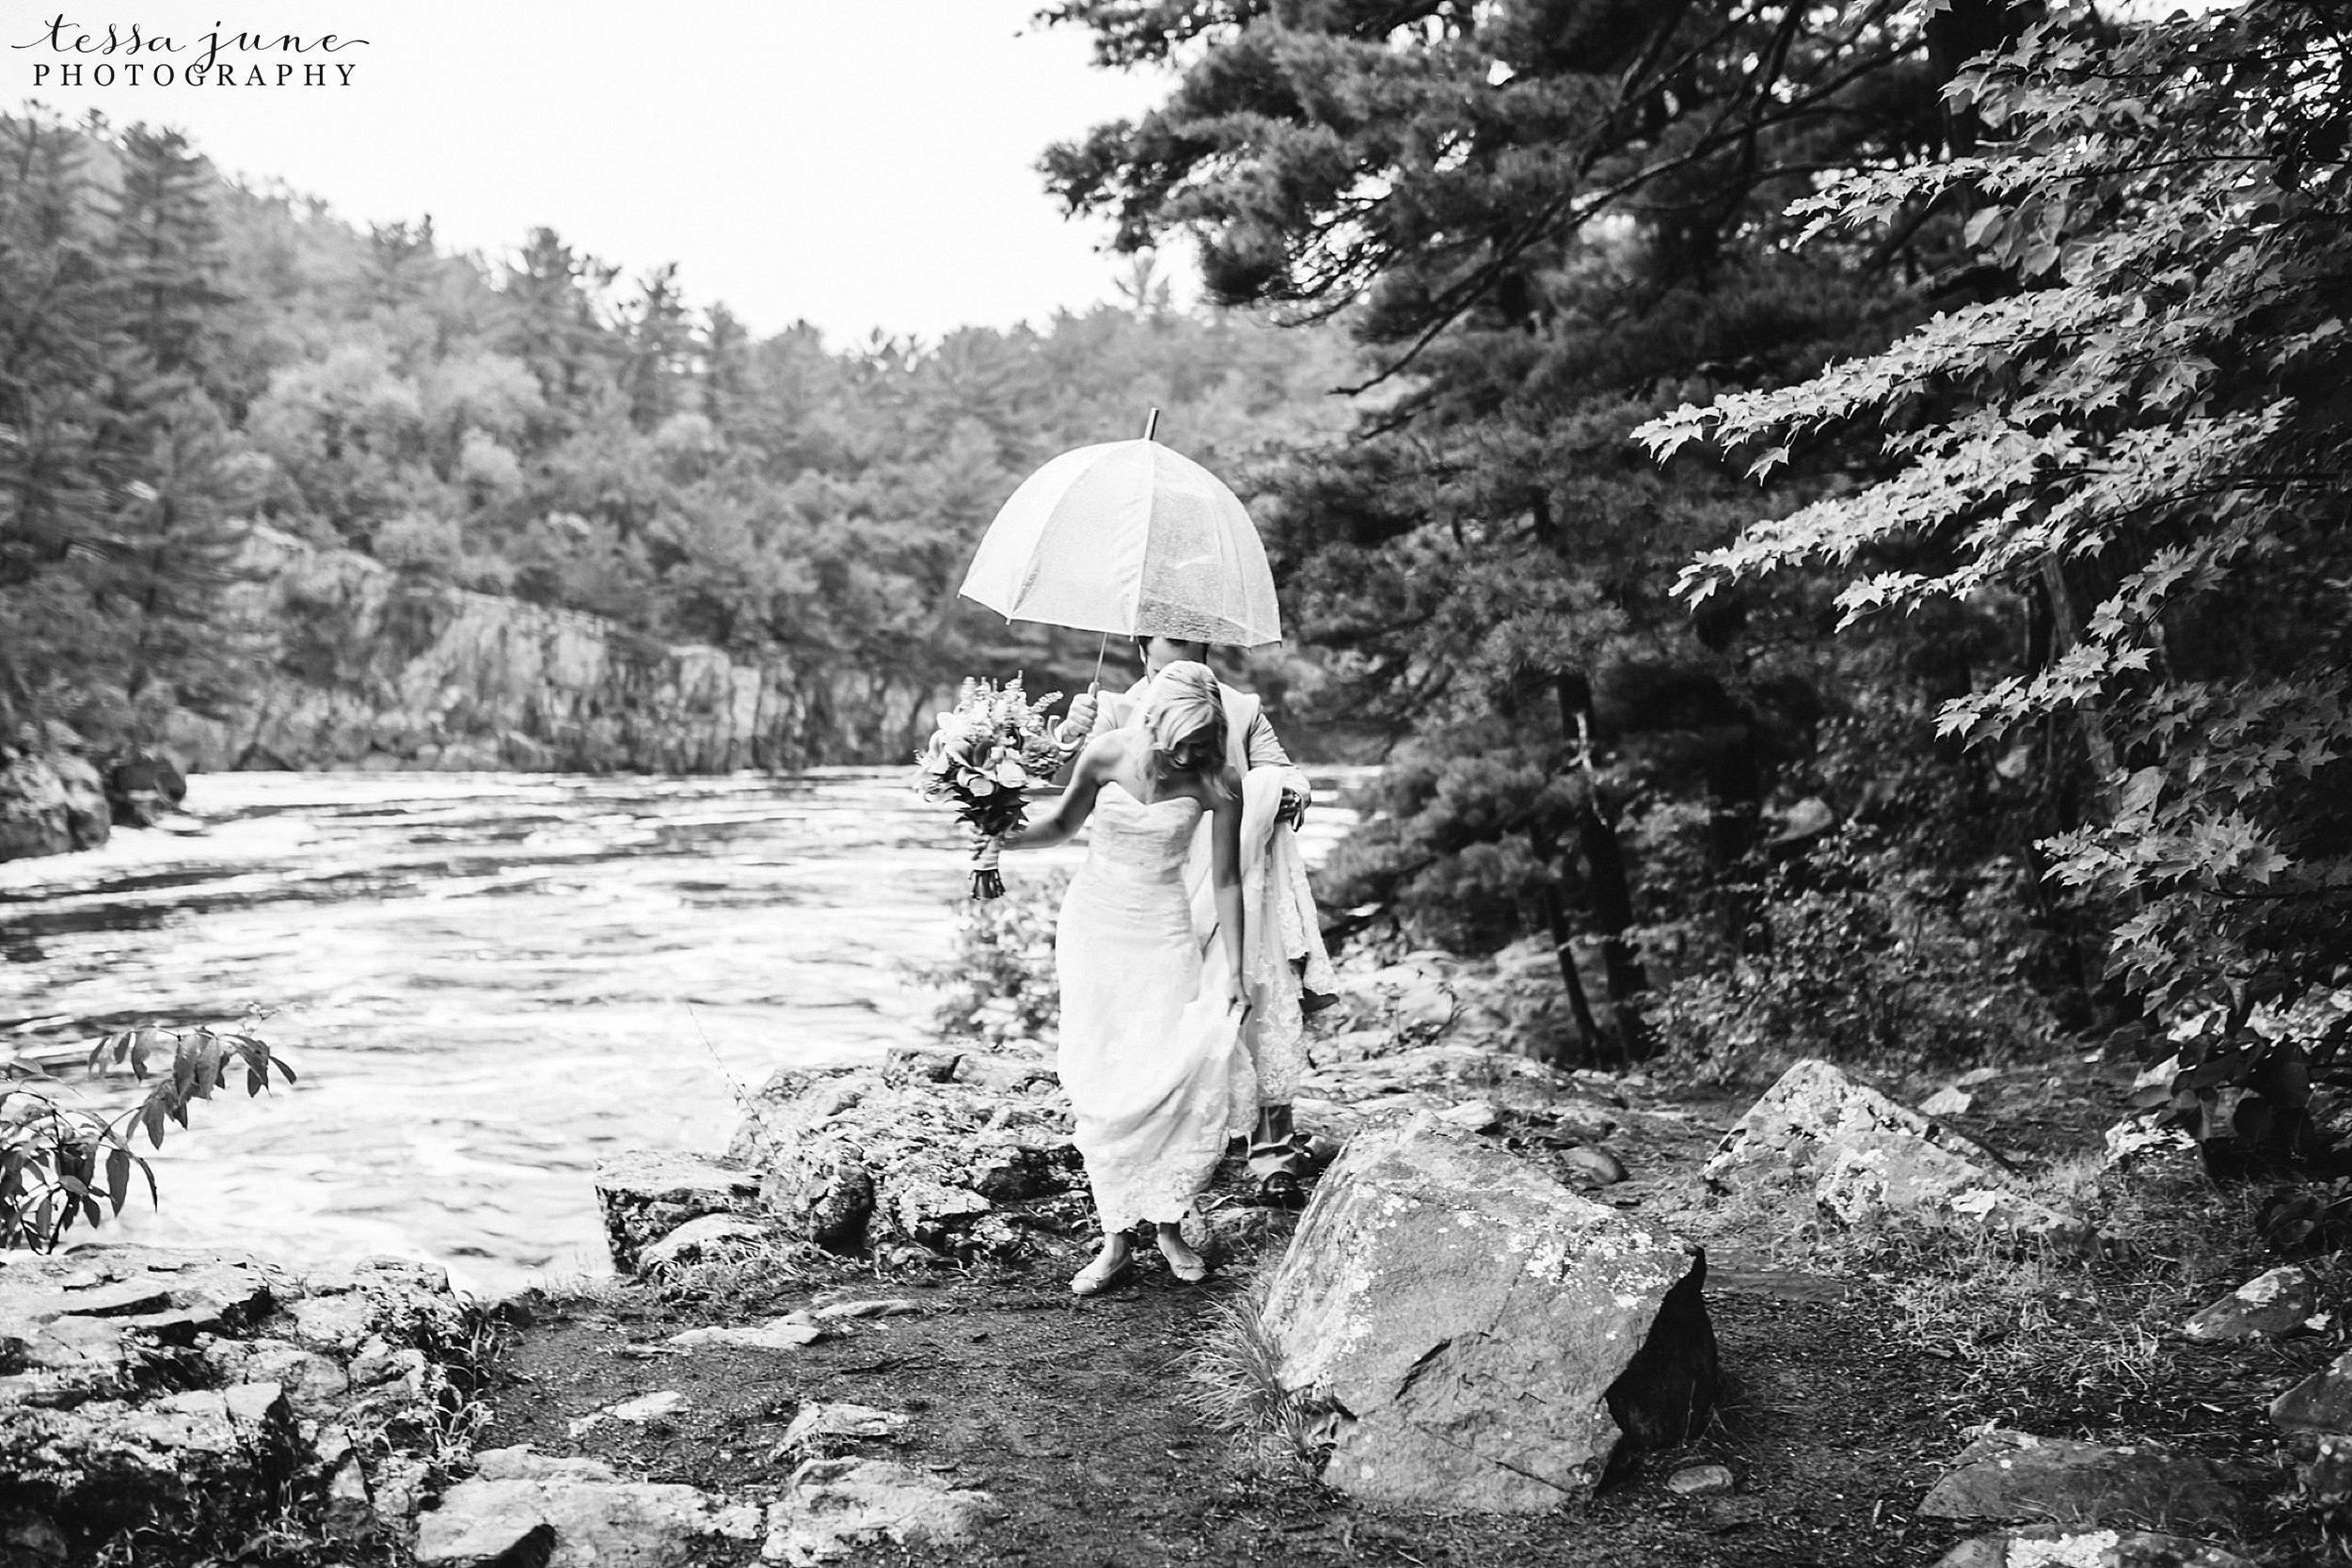 taylors-falls-rainy-elopement-wedding-interstate-state-park-5.jpg